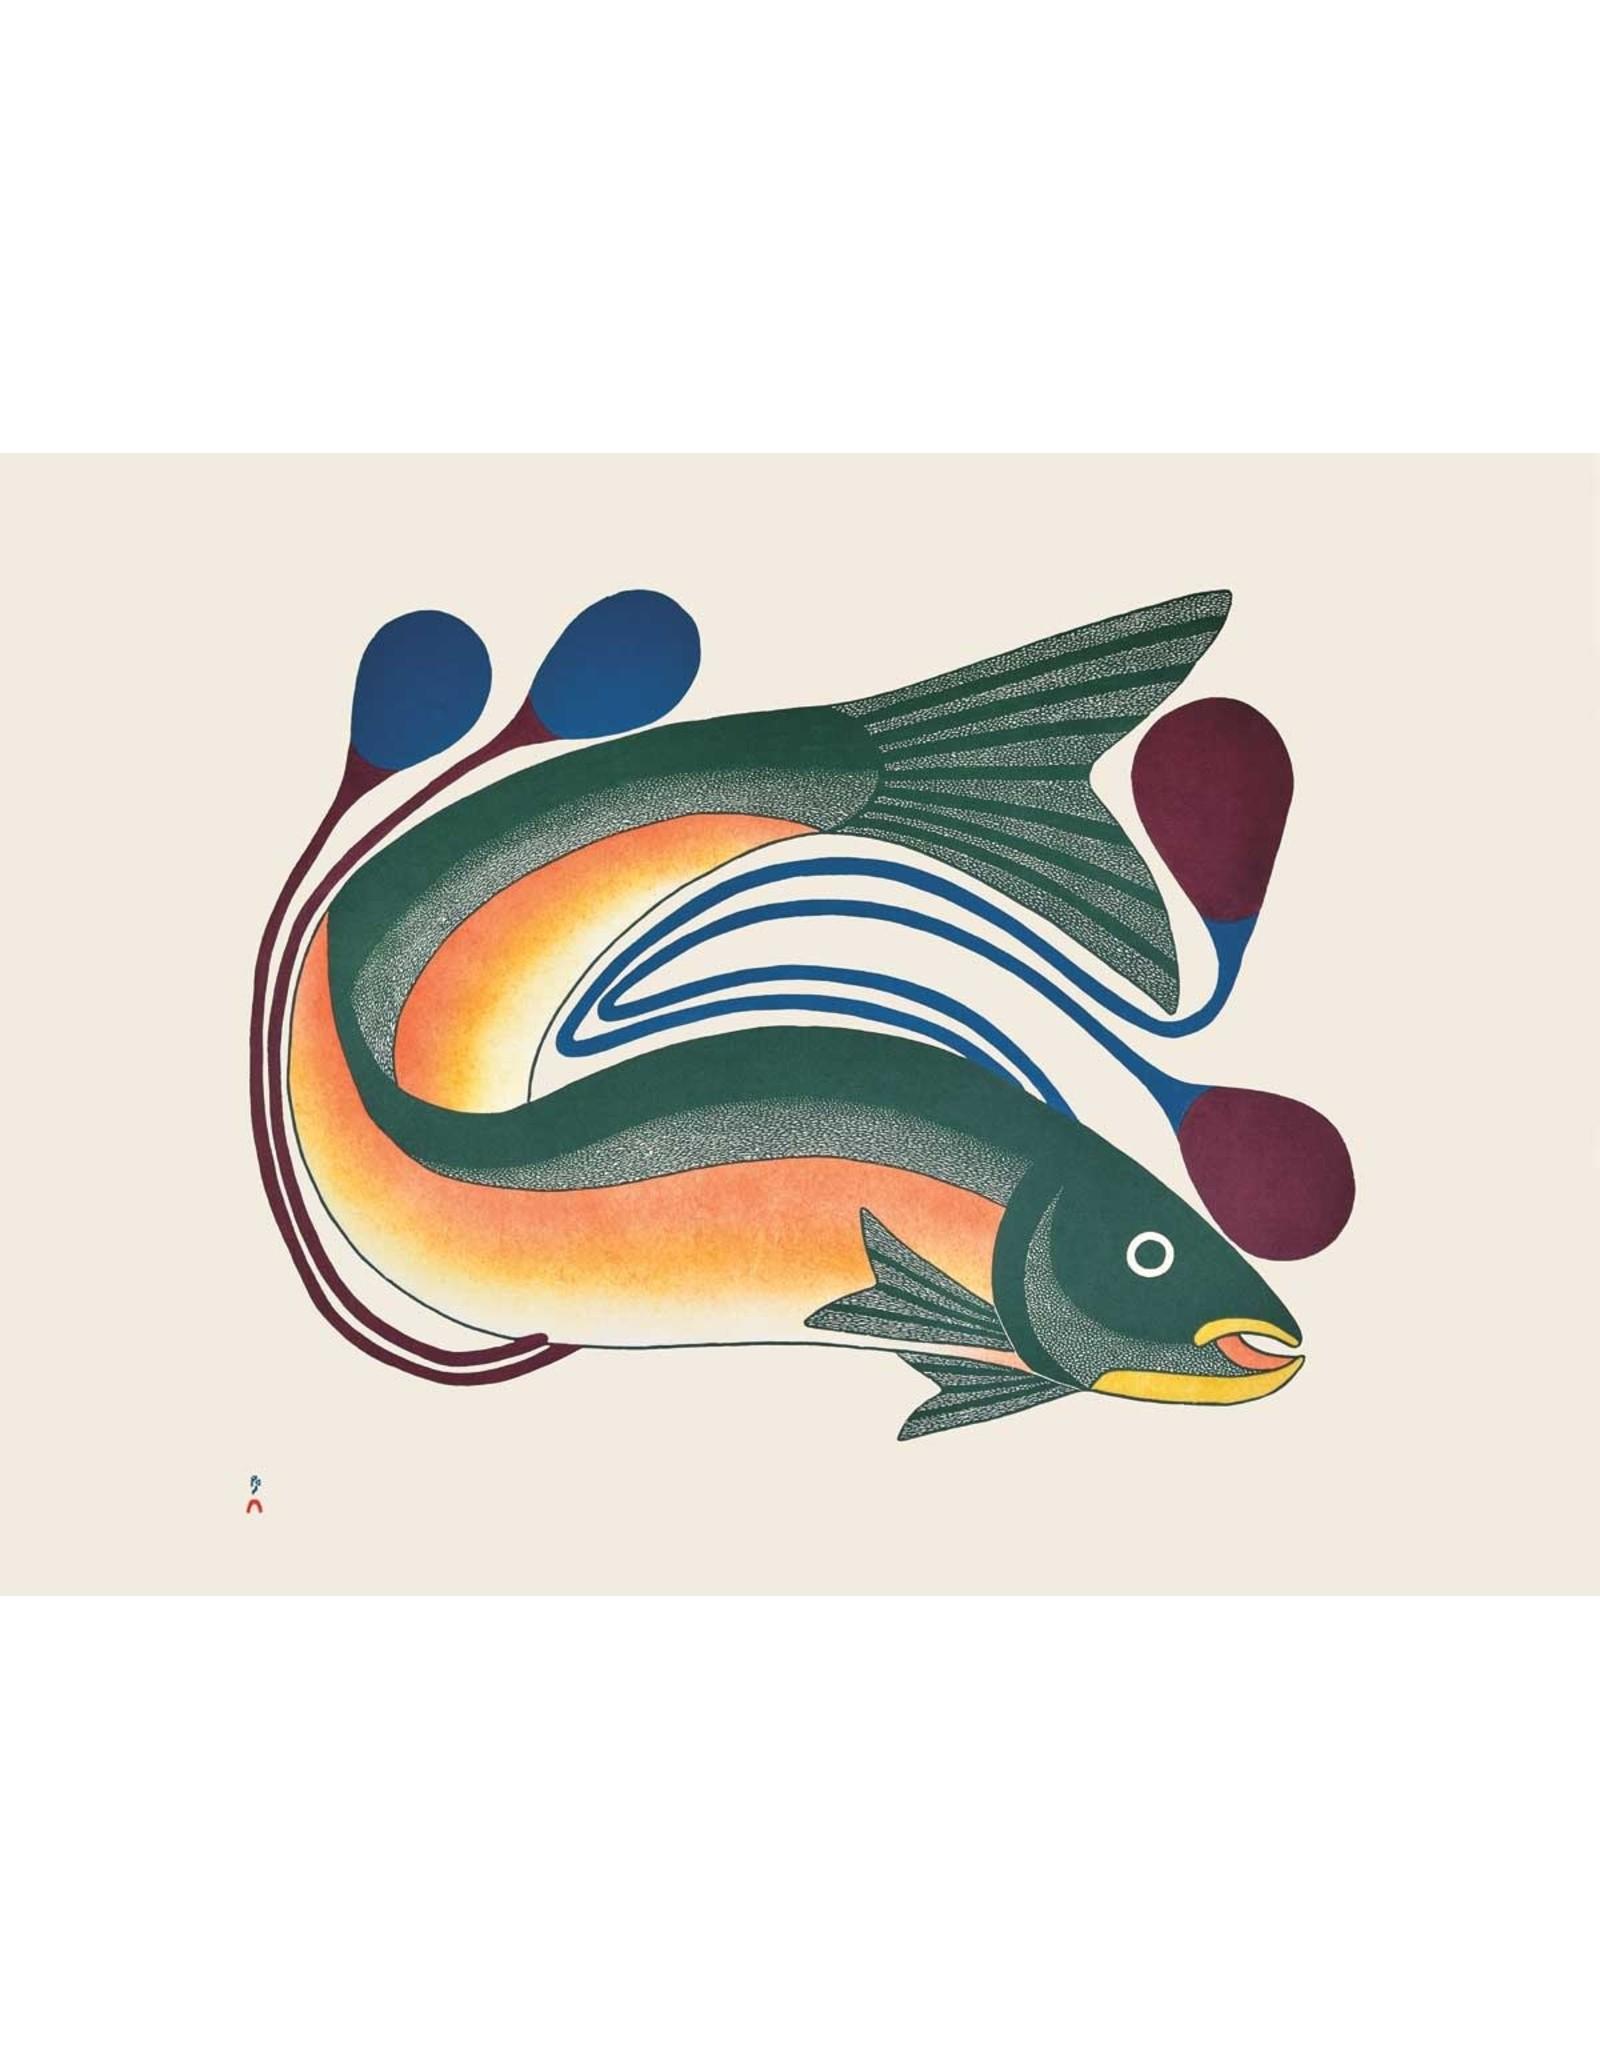 Iqalutsiavak (Beautiful Fish) by Kenojuak Ashevak Card